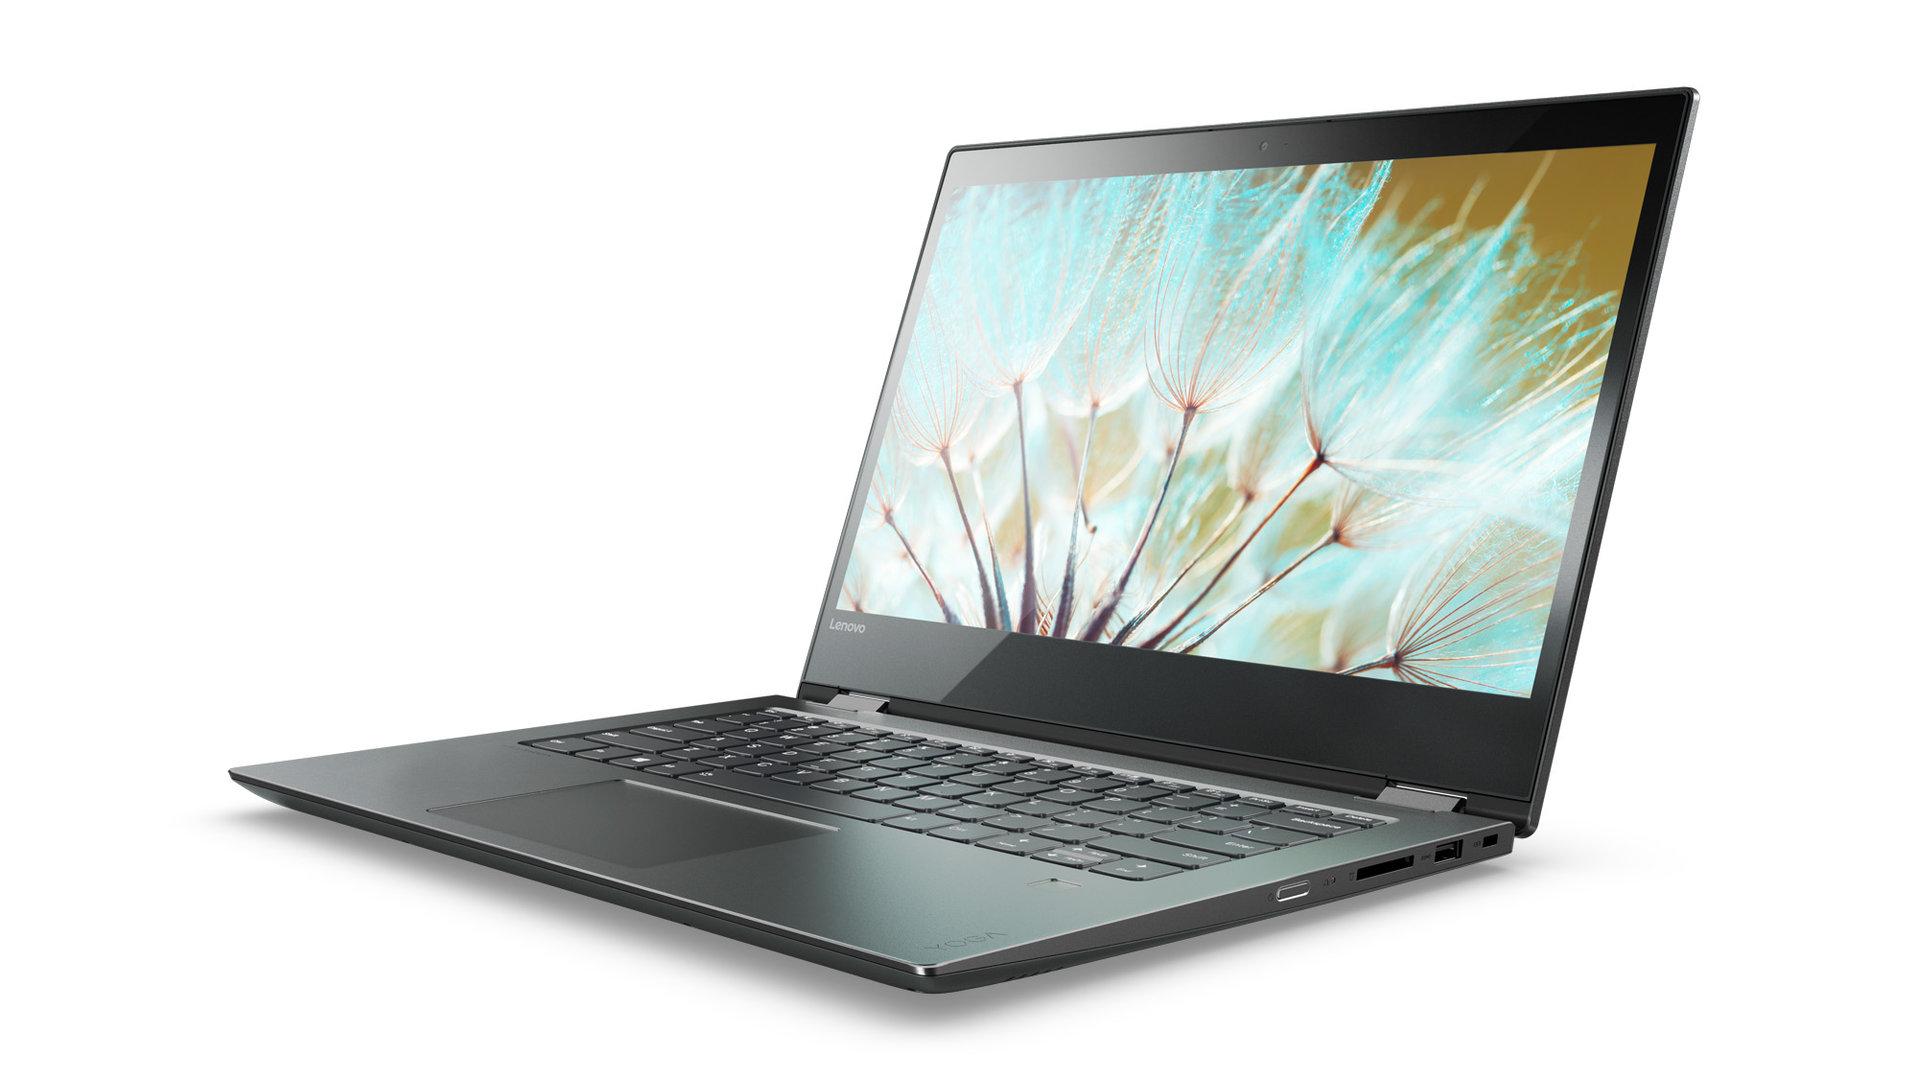 Lenovo Yoga 520 (14 Zoll) in Schwarz